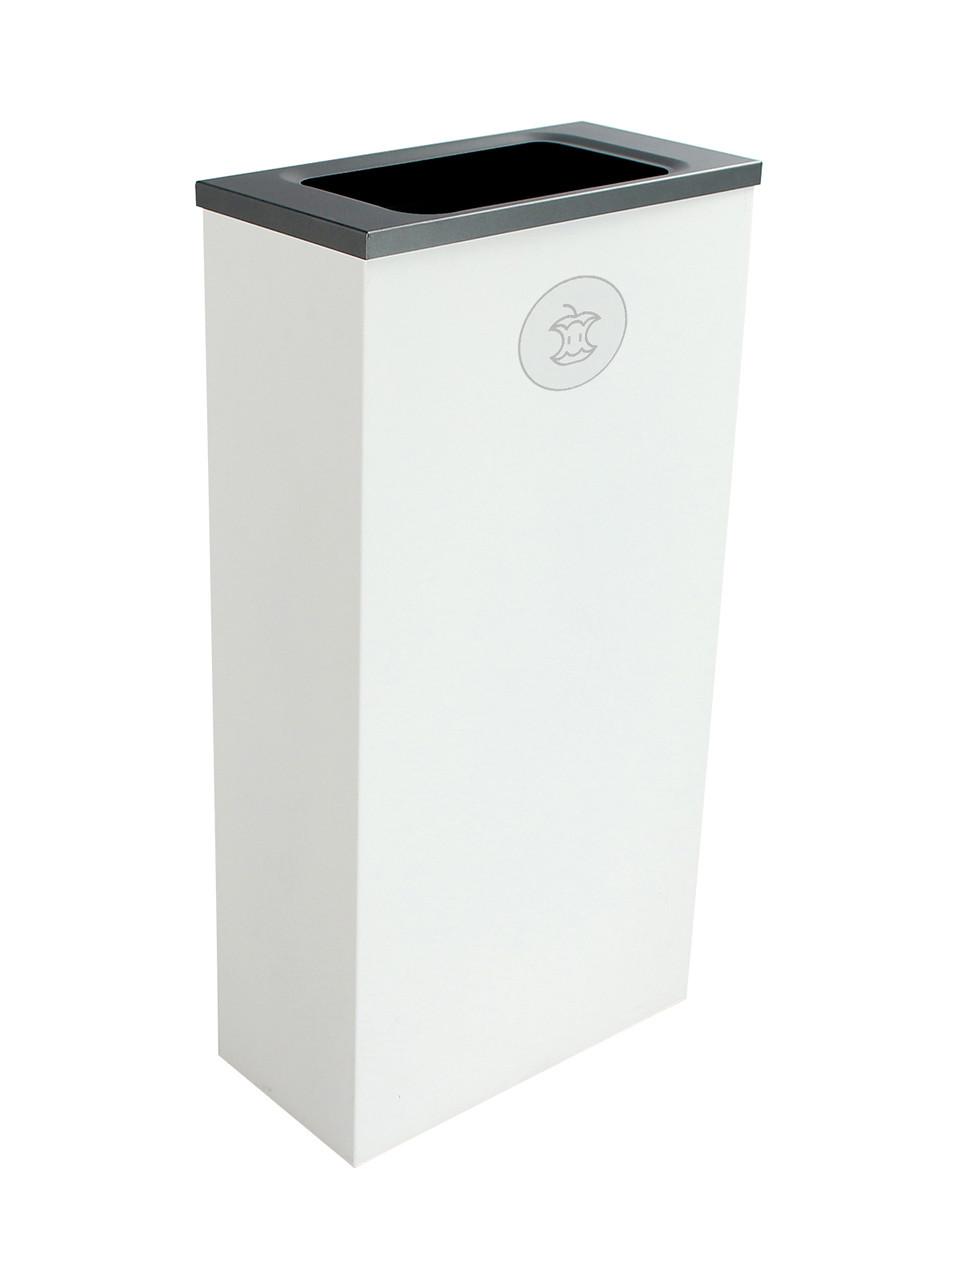 10 Gallon Steel Spectrum Slim Compost Bin White 8107072-4